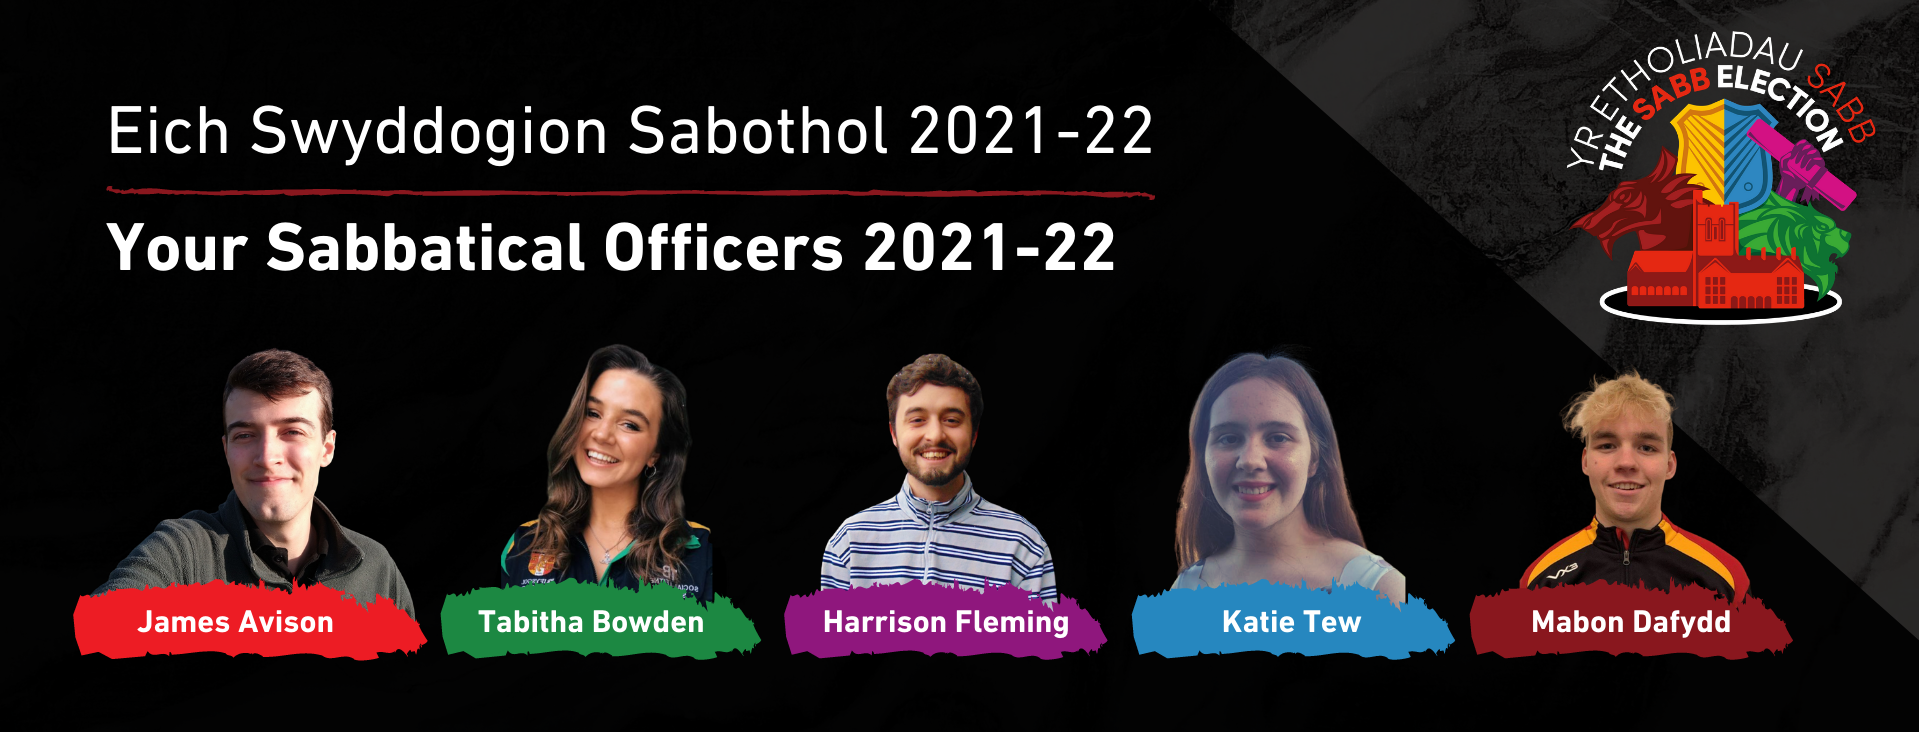 Sabb election 2021   winners web banner